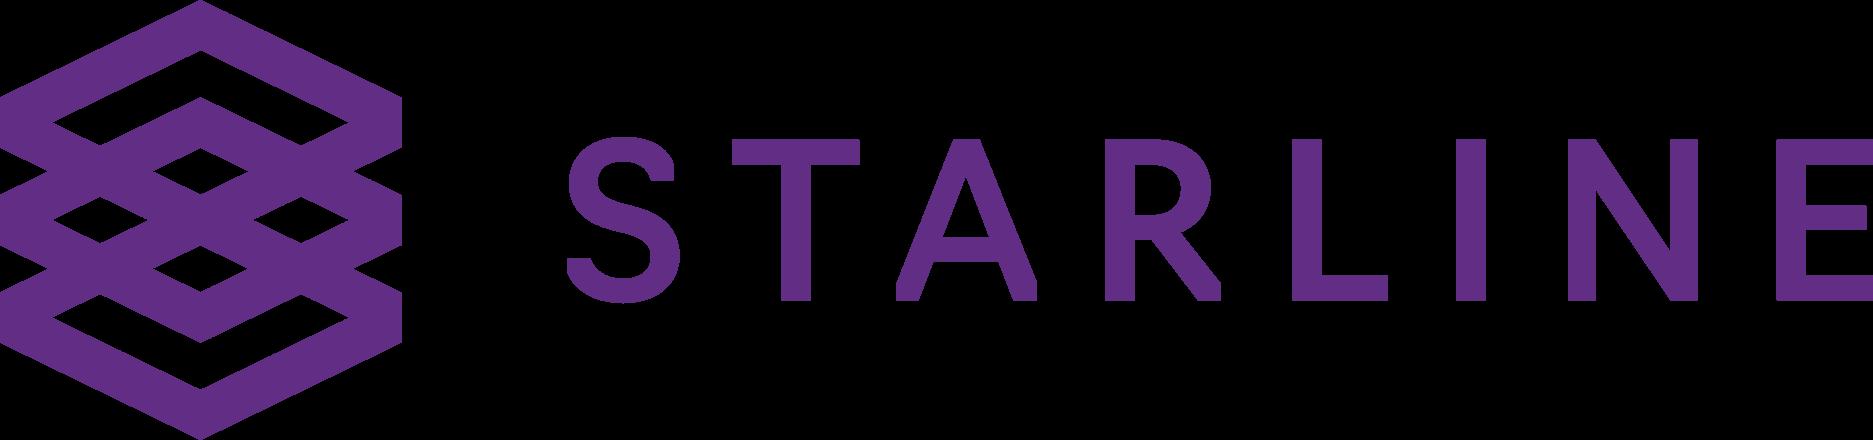 Starline Computer GmbH